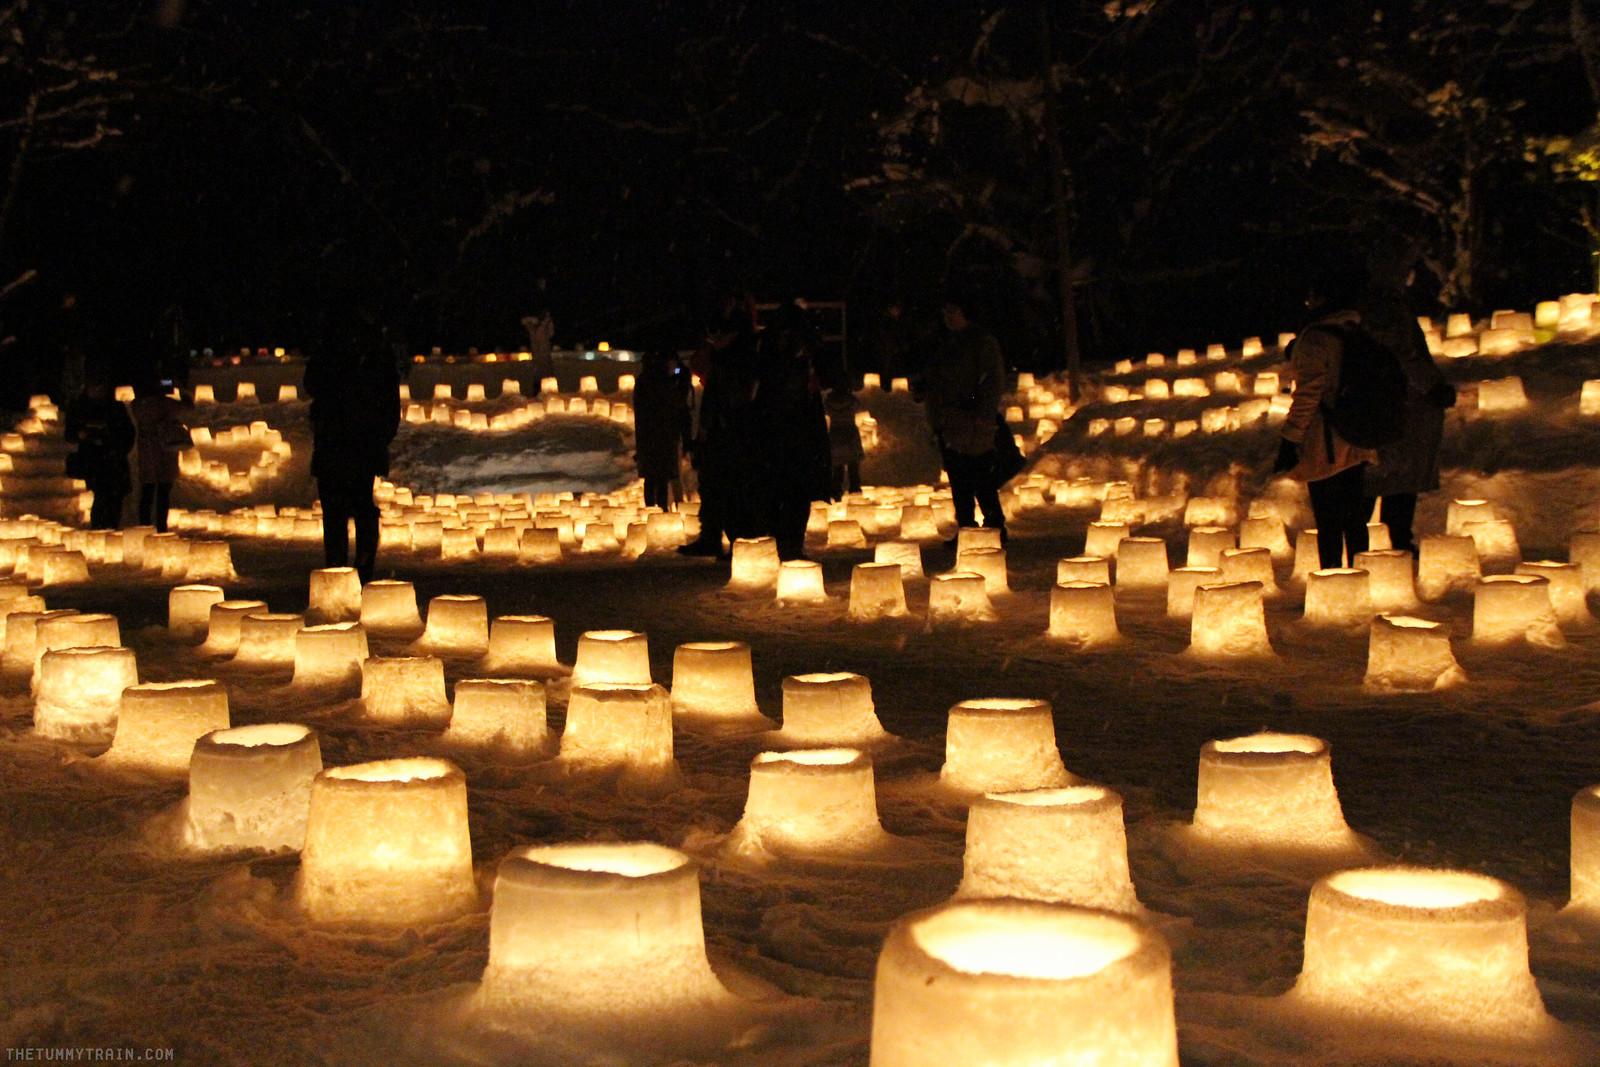 32915999025 994620683c h - Sapporo Snow And Smile: 8 Unforgettable Winter Experiences in Sapporo City